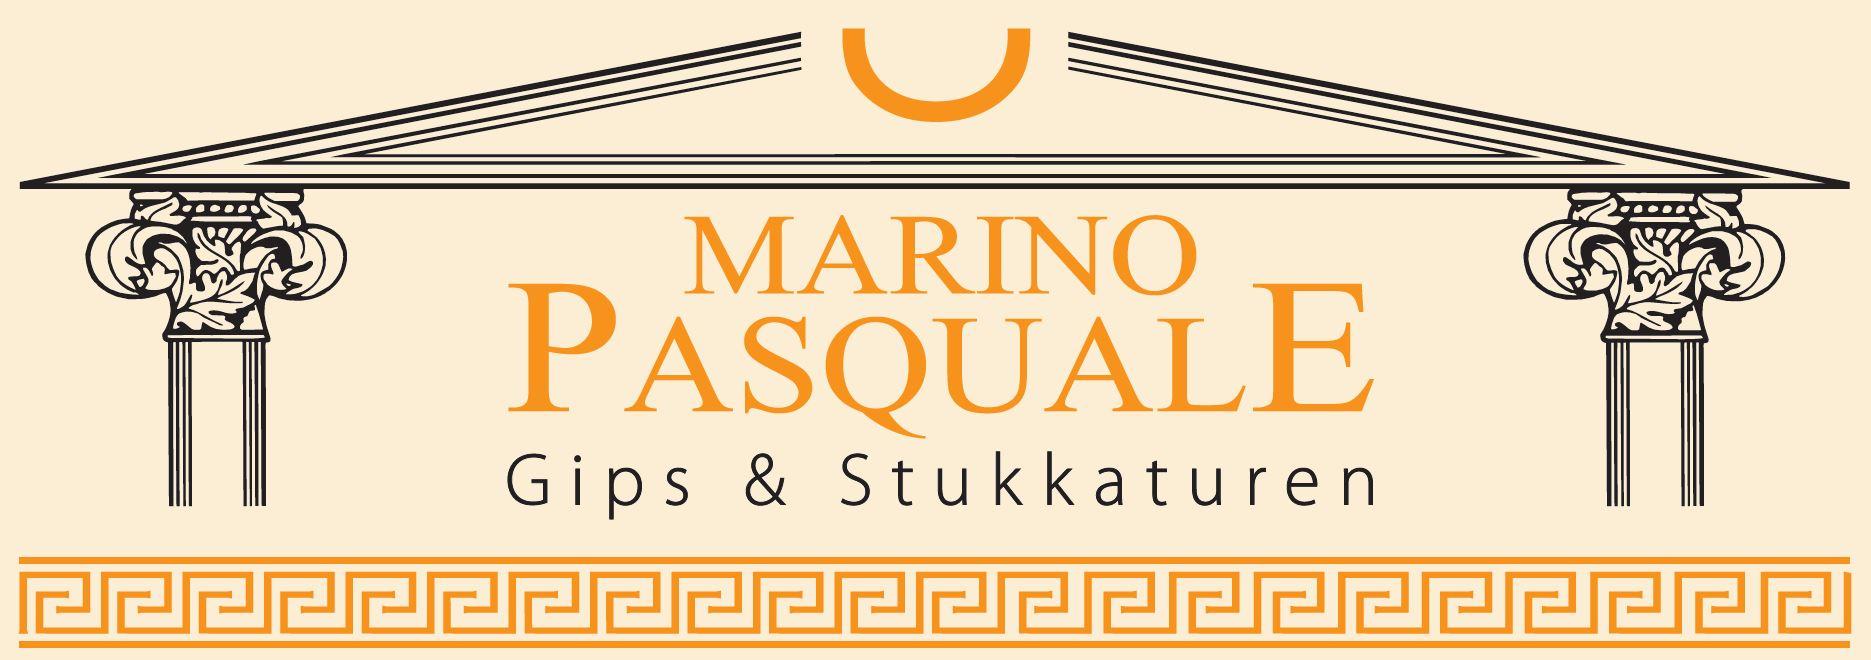 Marino Pasquale